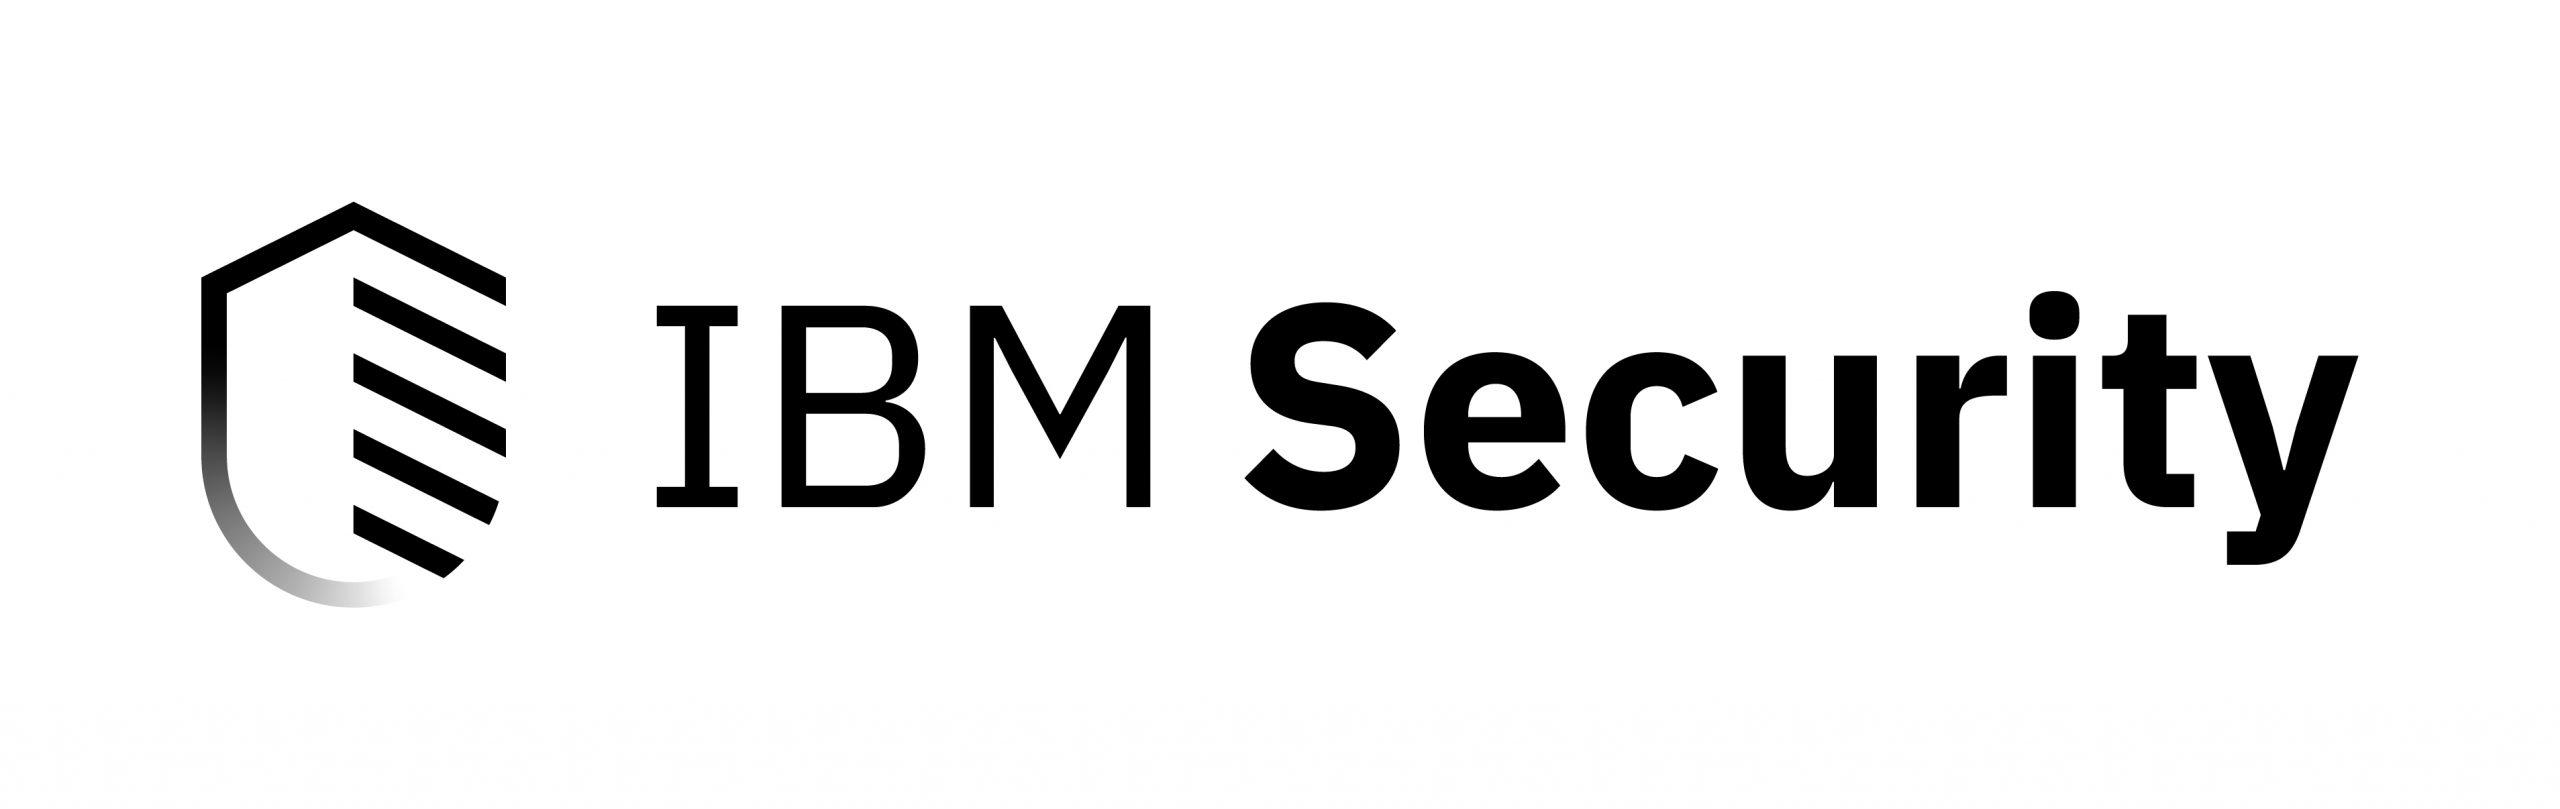 IBM Security Logo